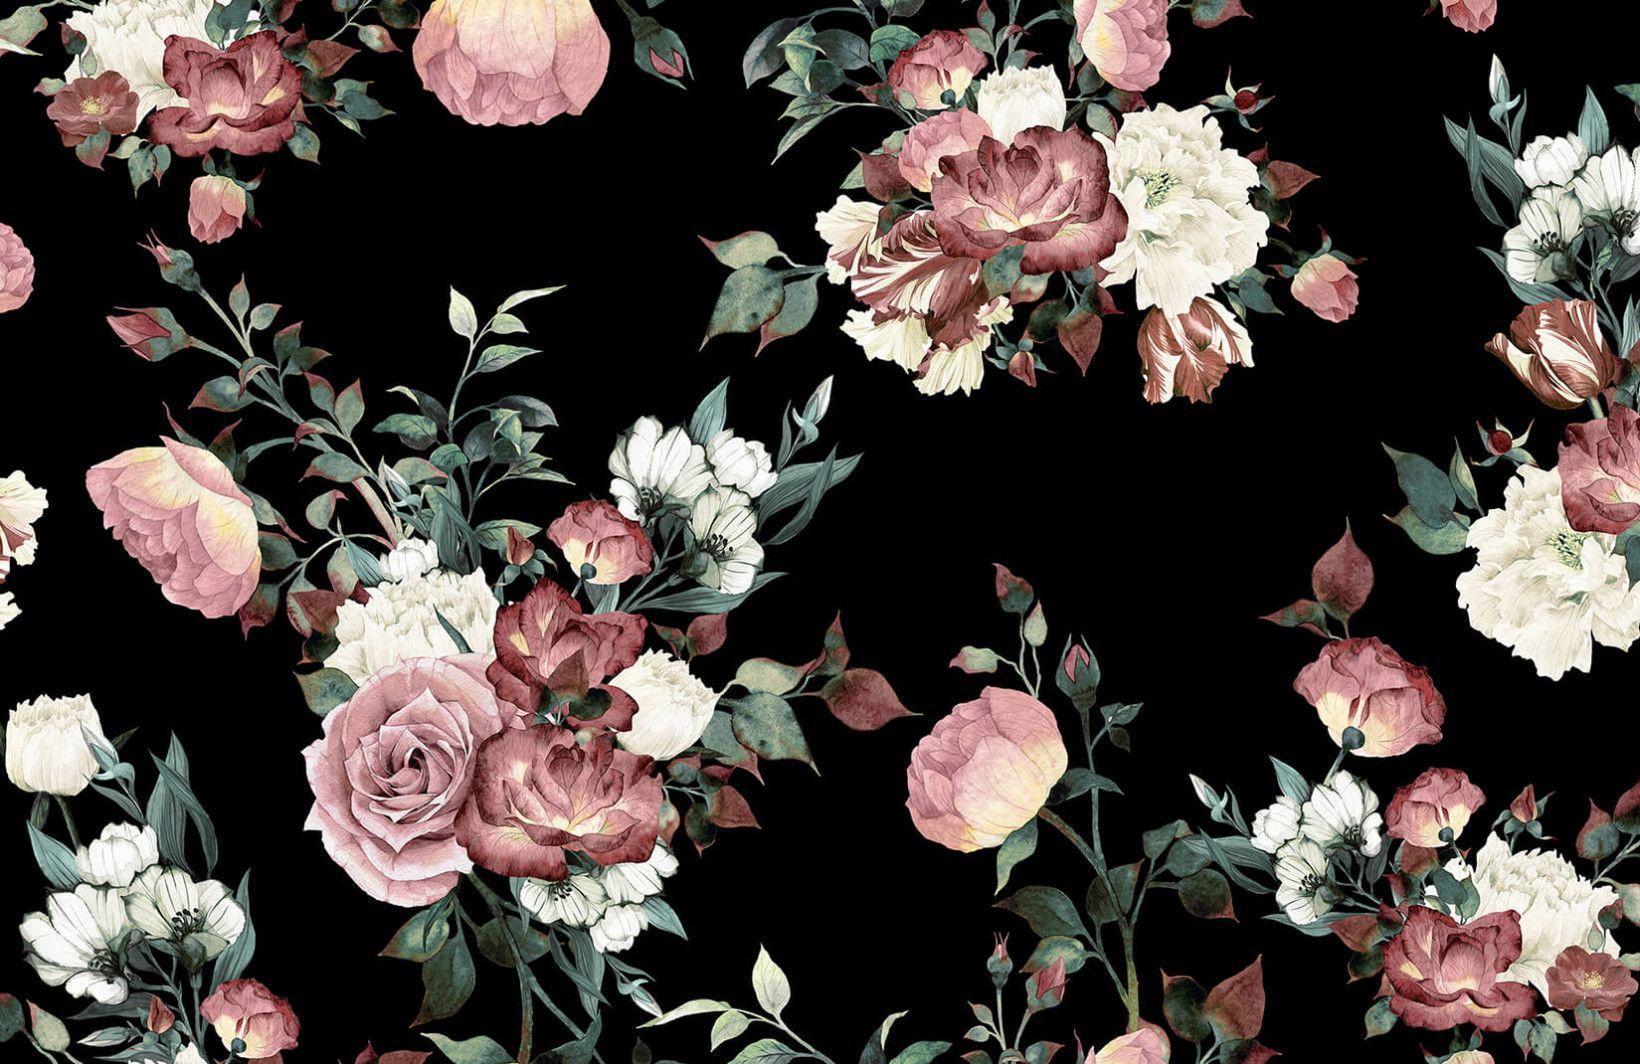 Vintage Pink And Cream Dark Floral Plain Vintage Flowers Wallpaper Black Floral Wallpaper Vintage Floral Wallpapers